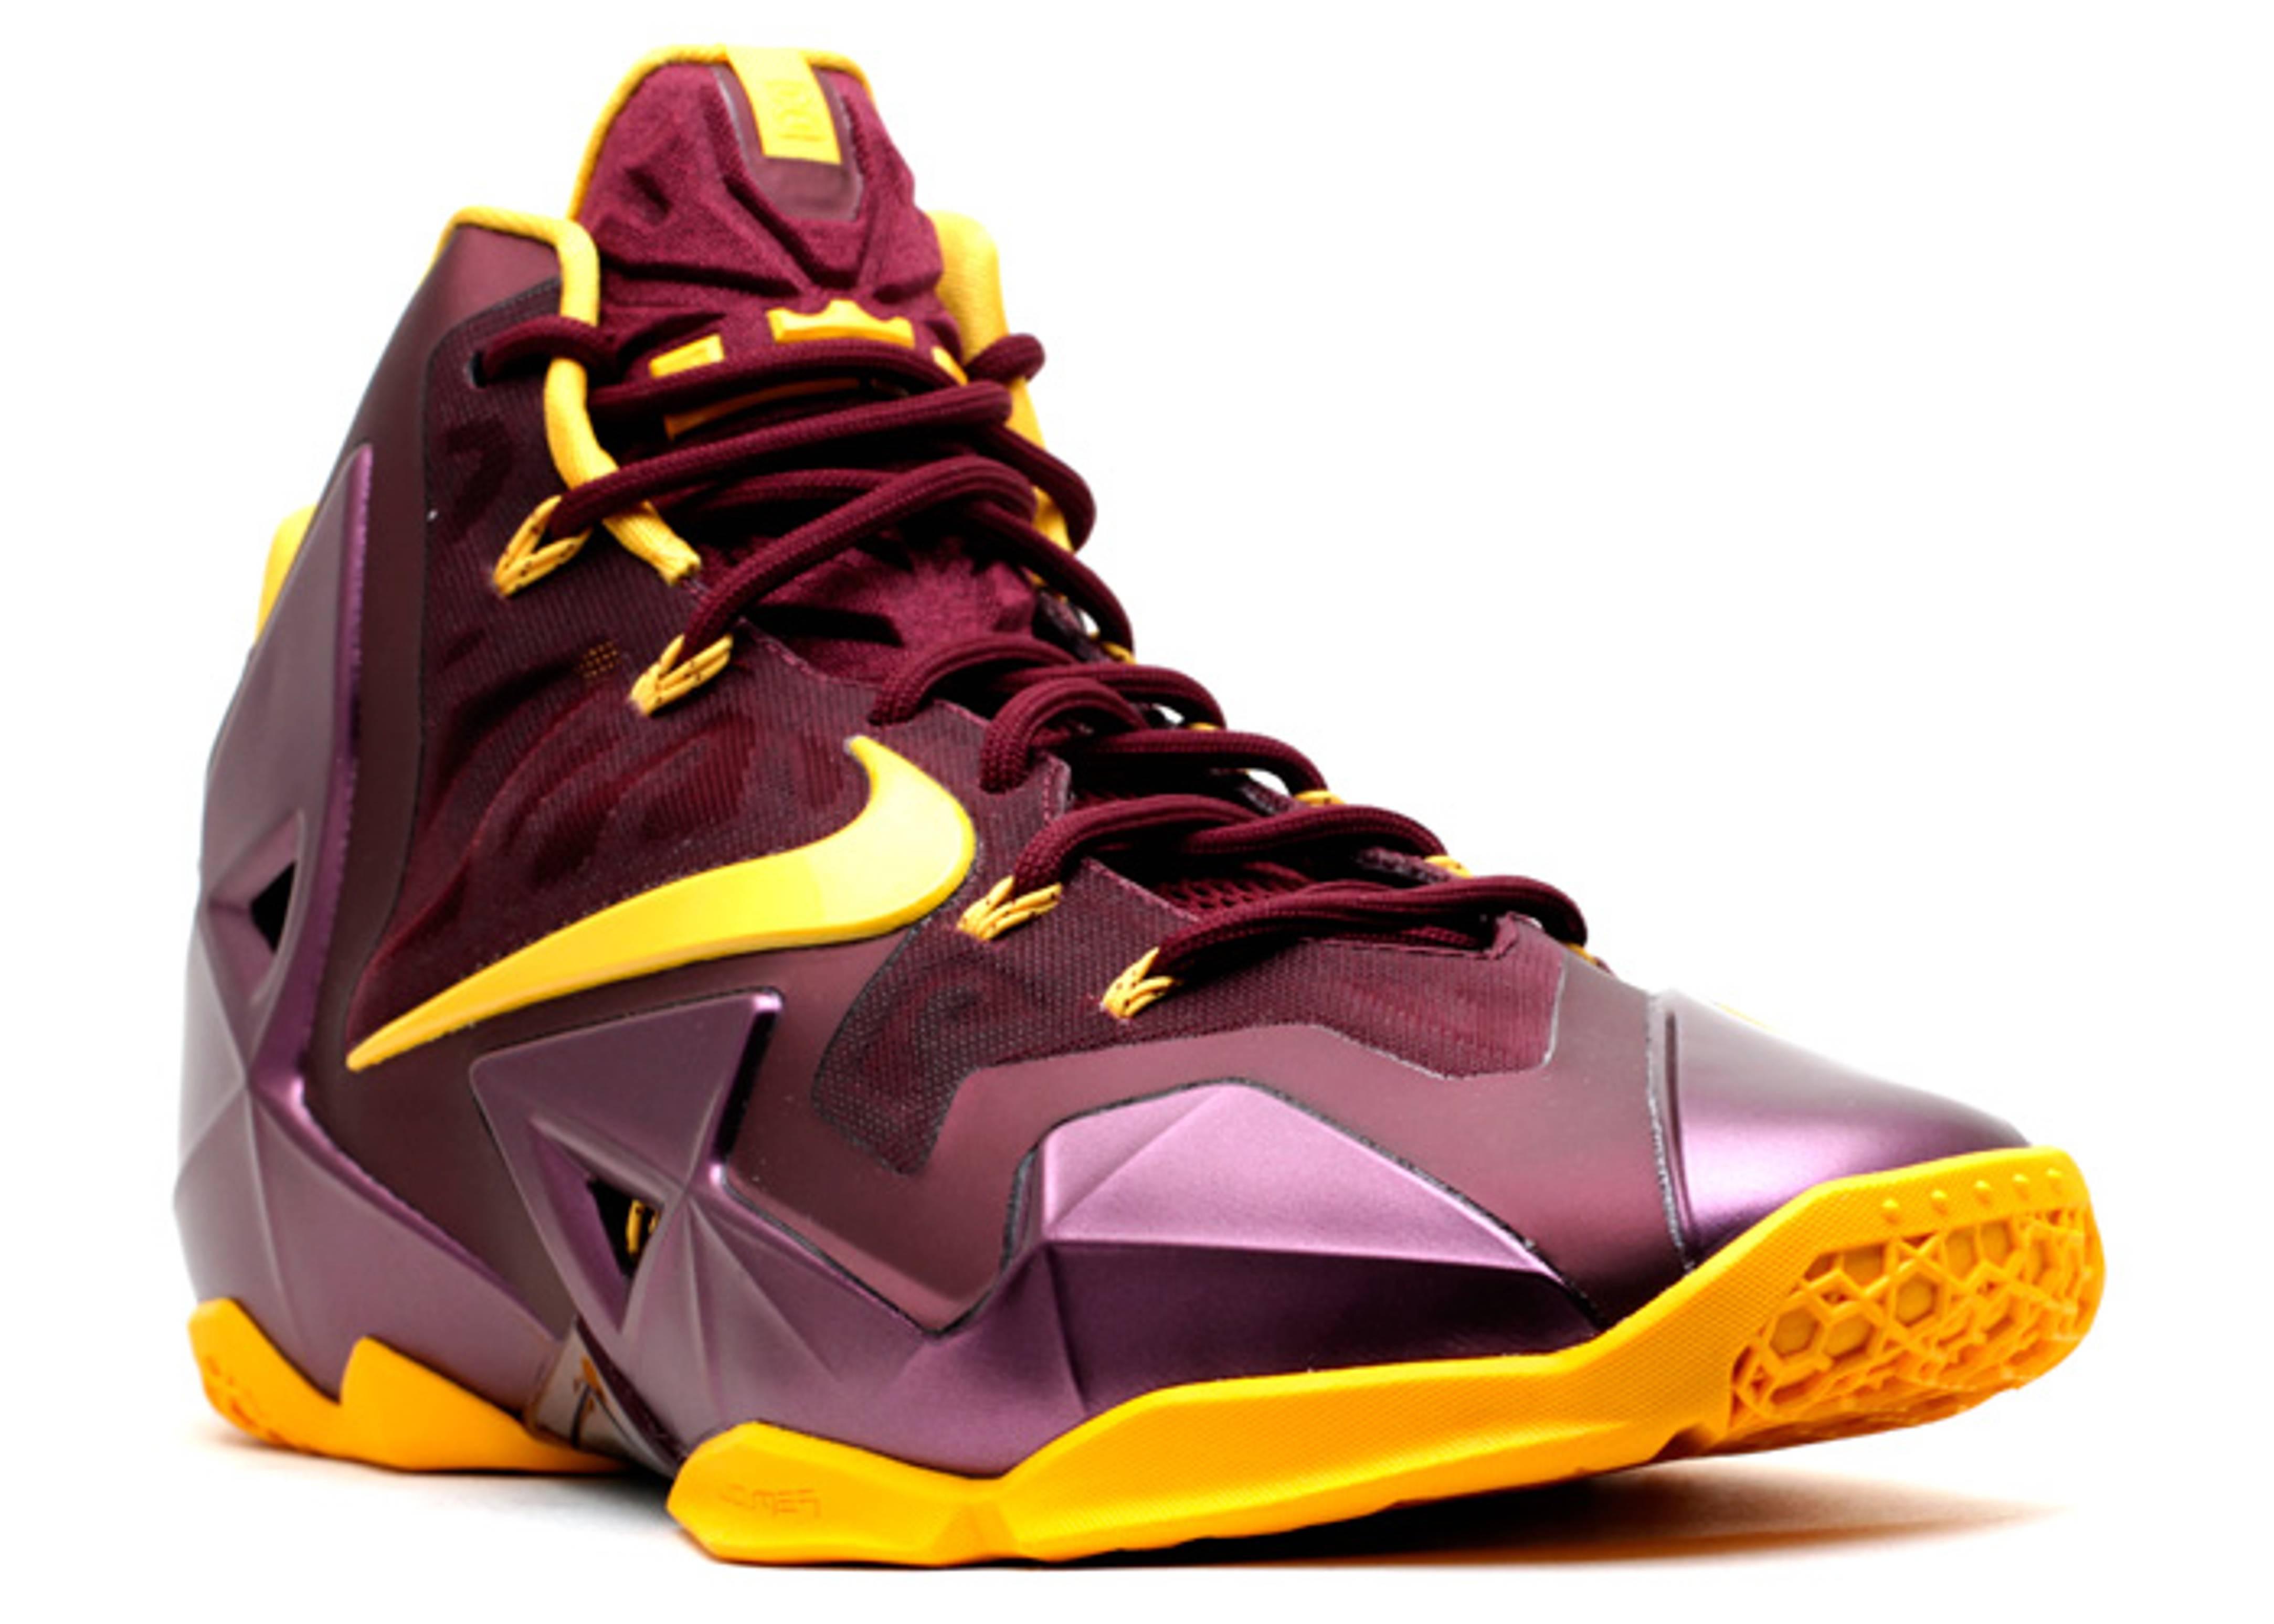 new product efe07 c3556 Nike Lebron 11 u201cCTKu201d